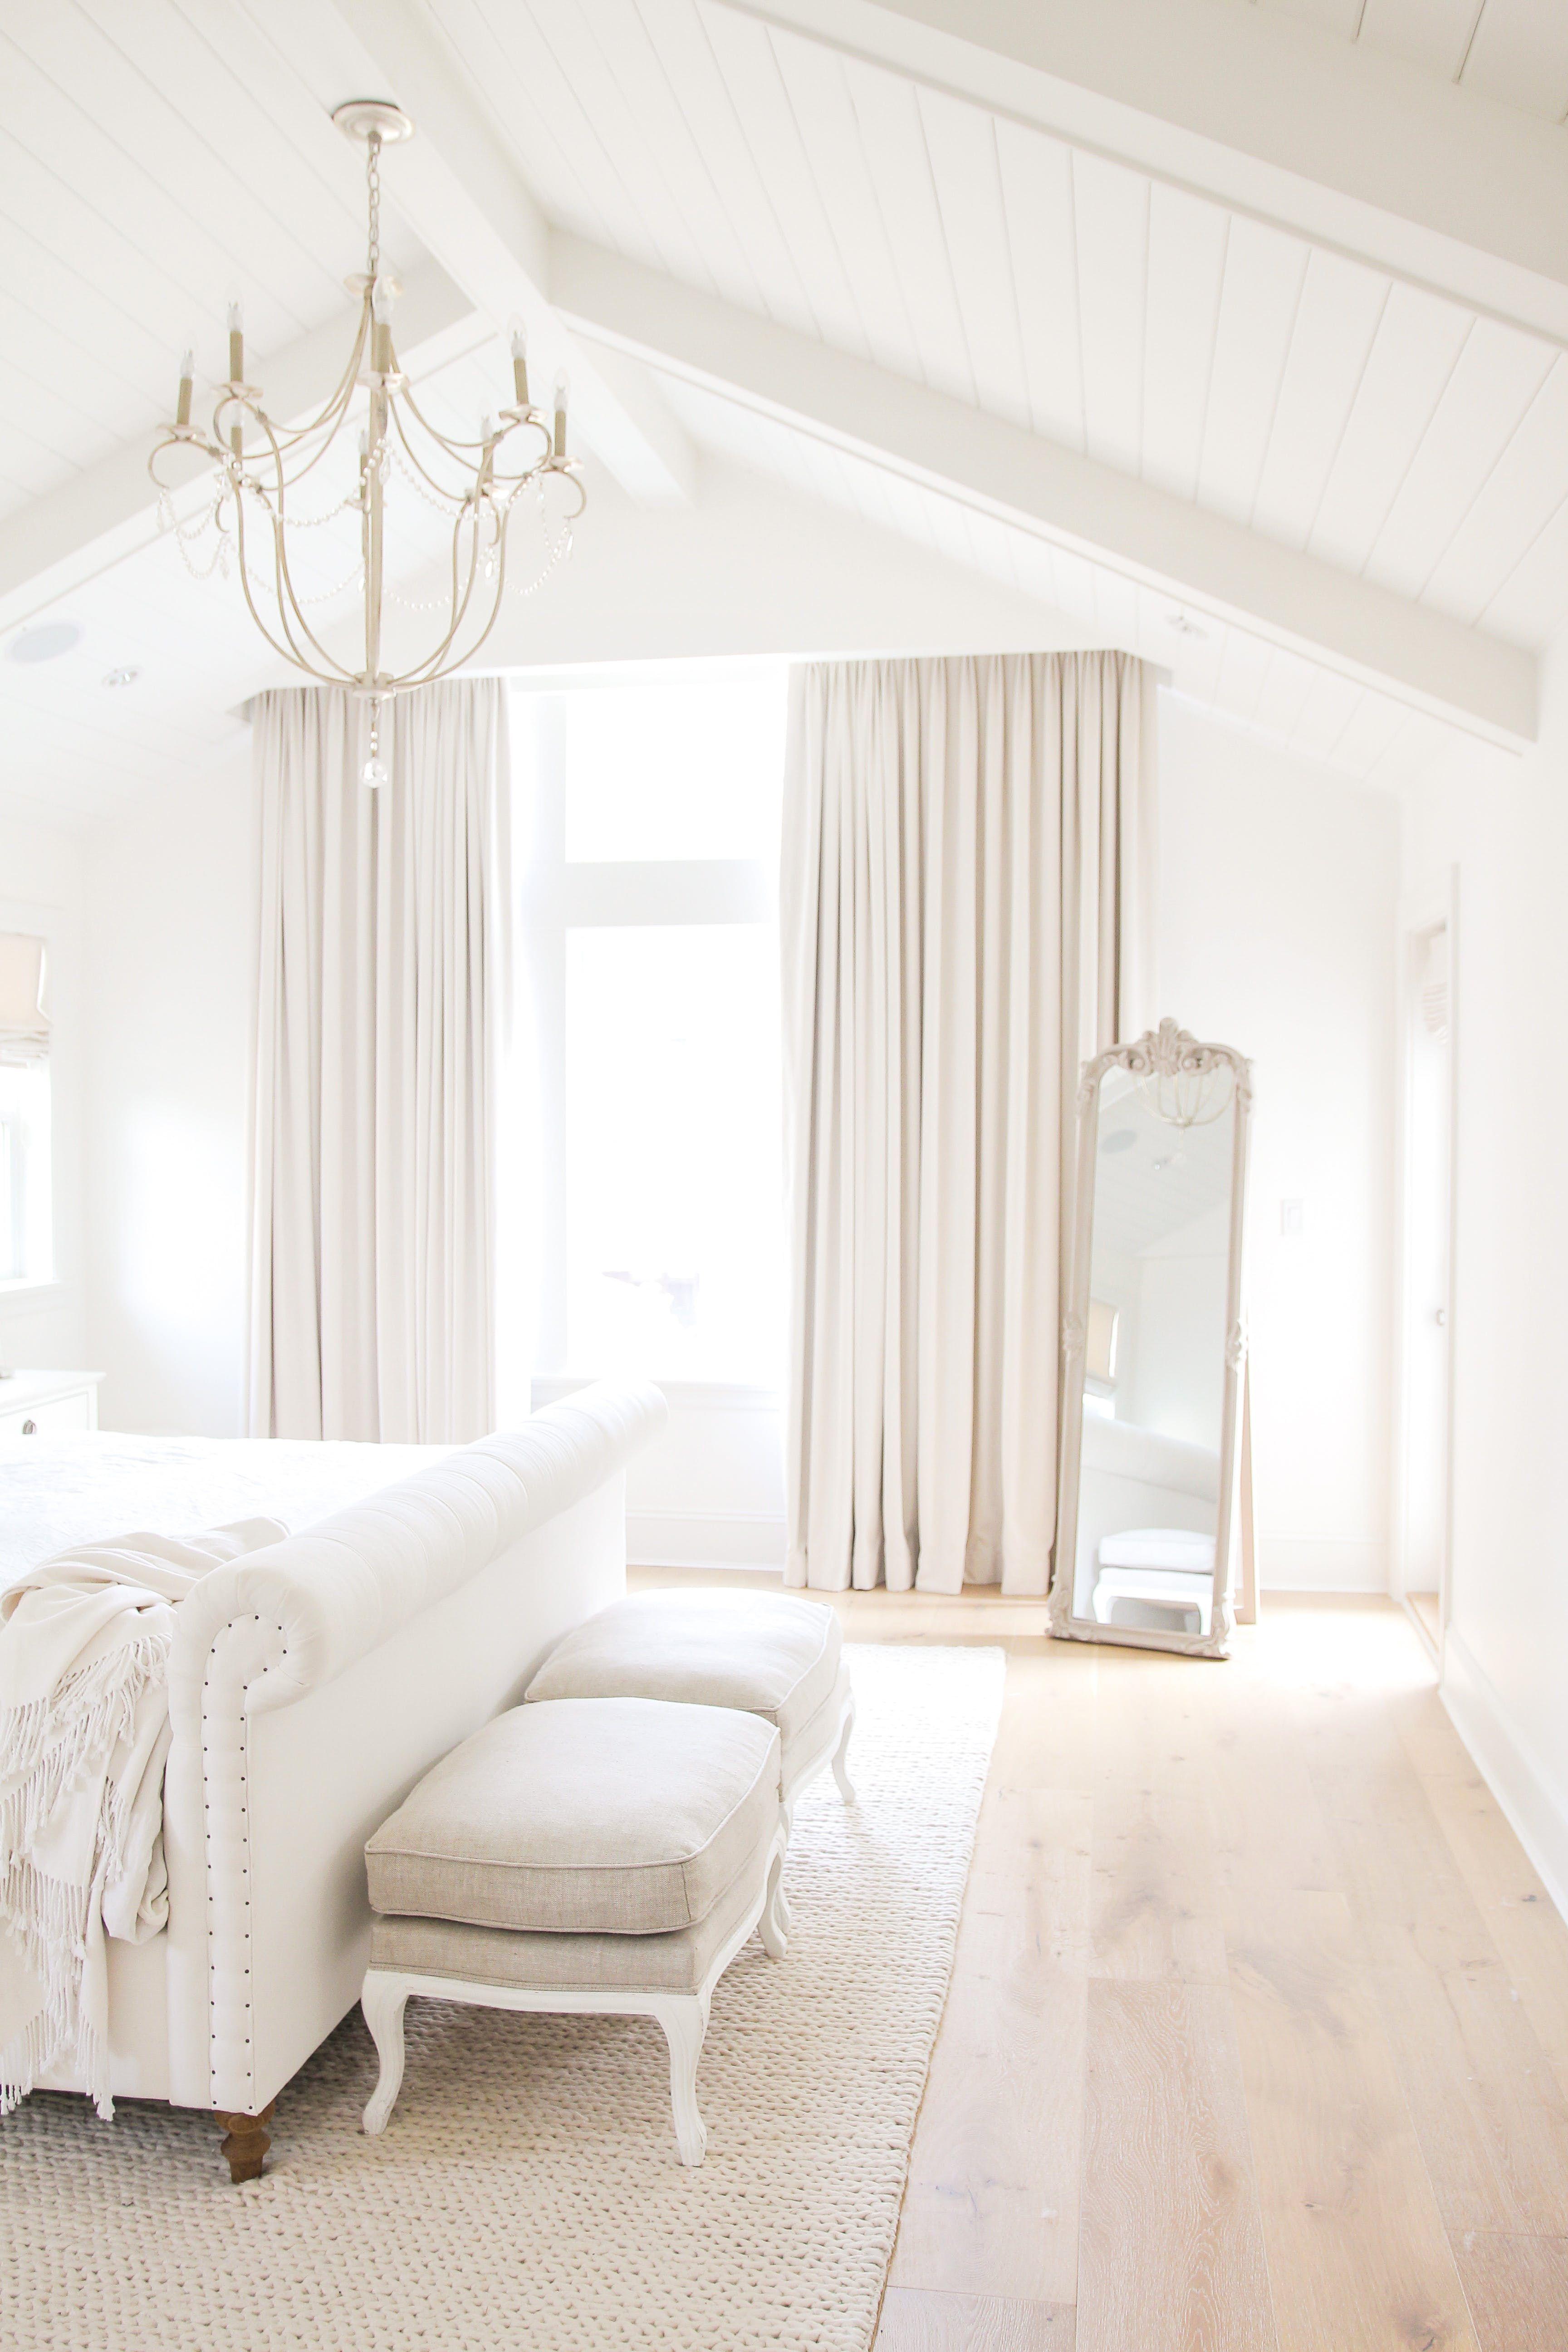 #Greathomedecorideasforthebedroom